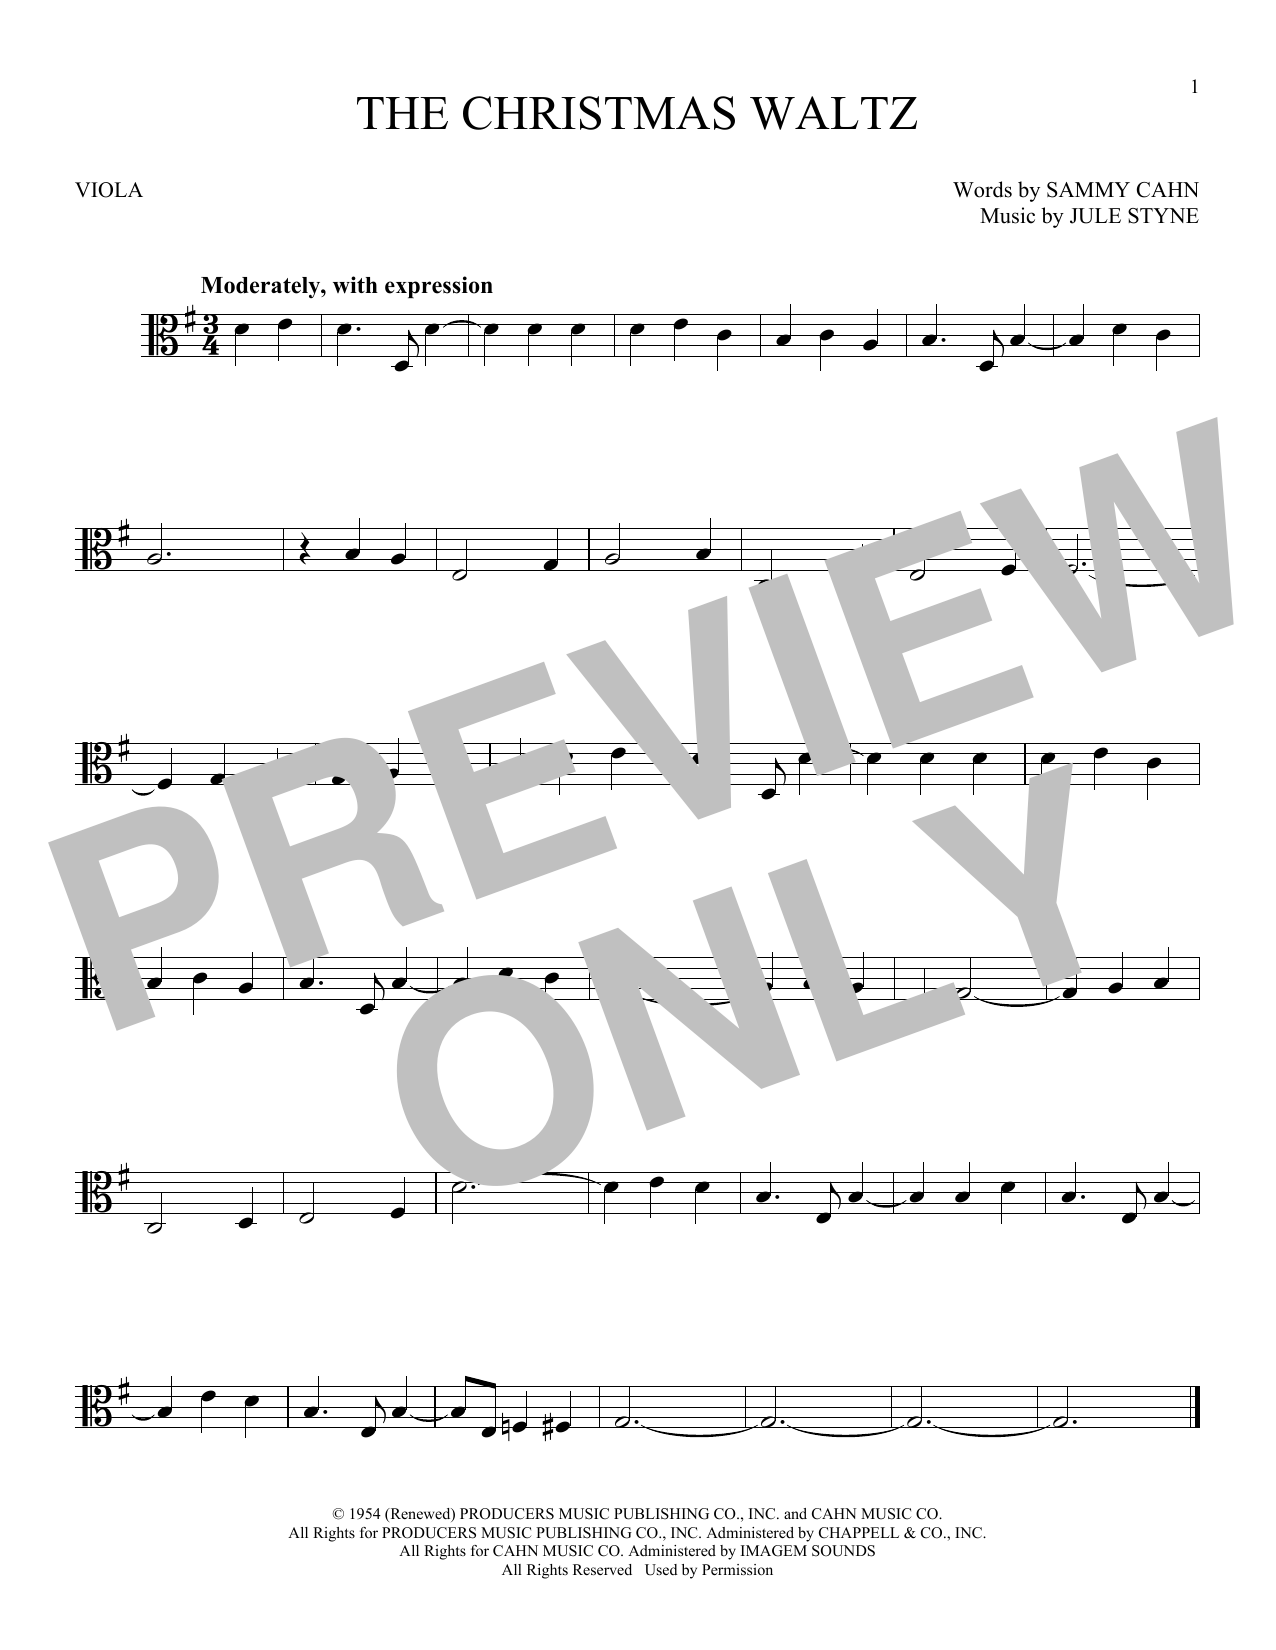 The Christmas Waltz Sheet Music